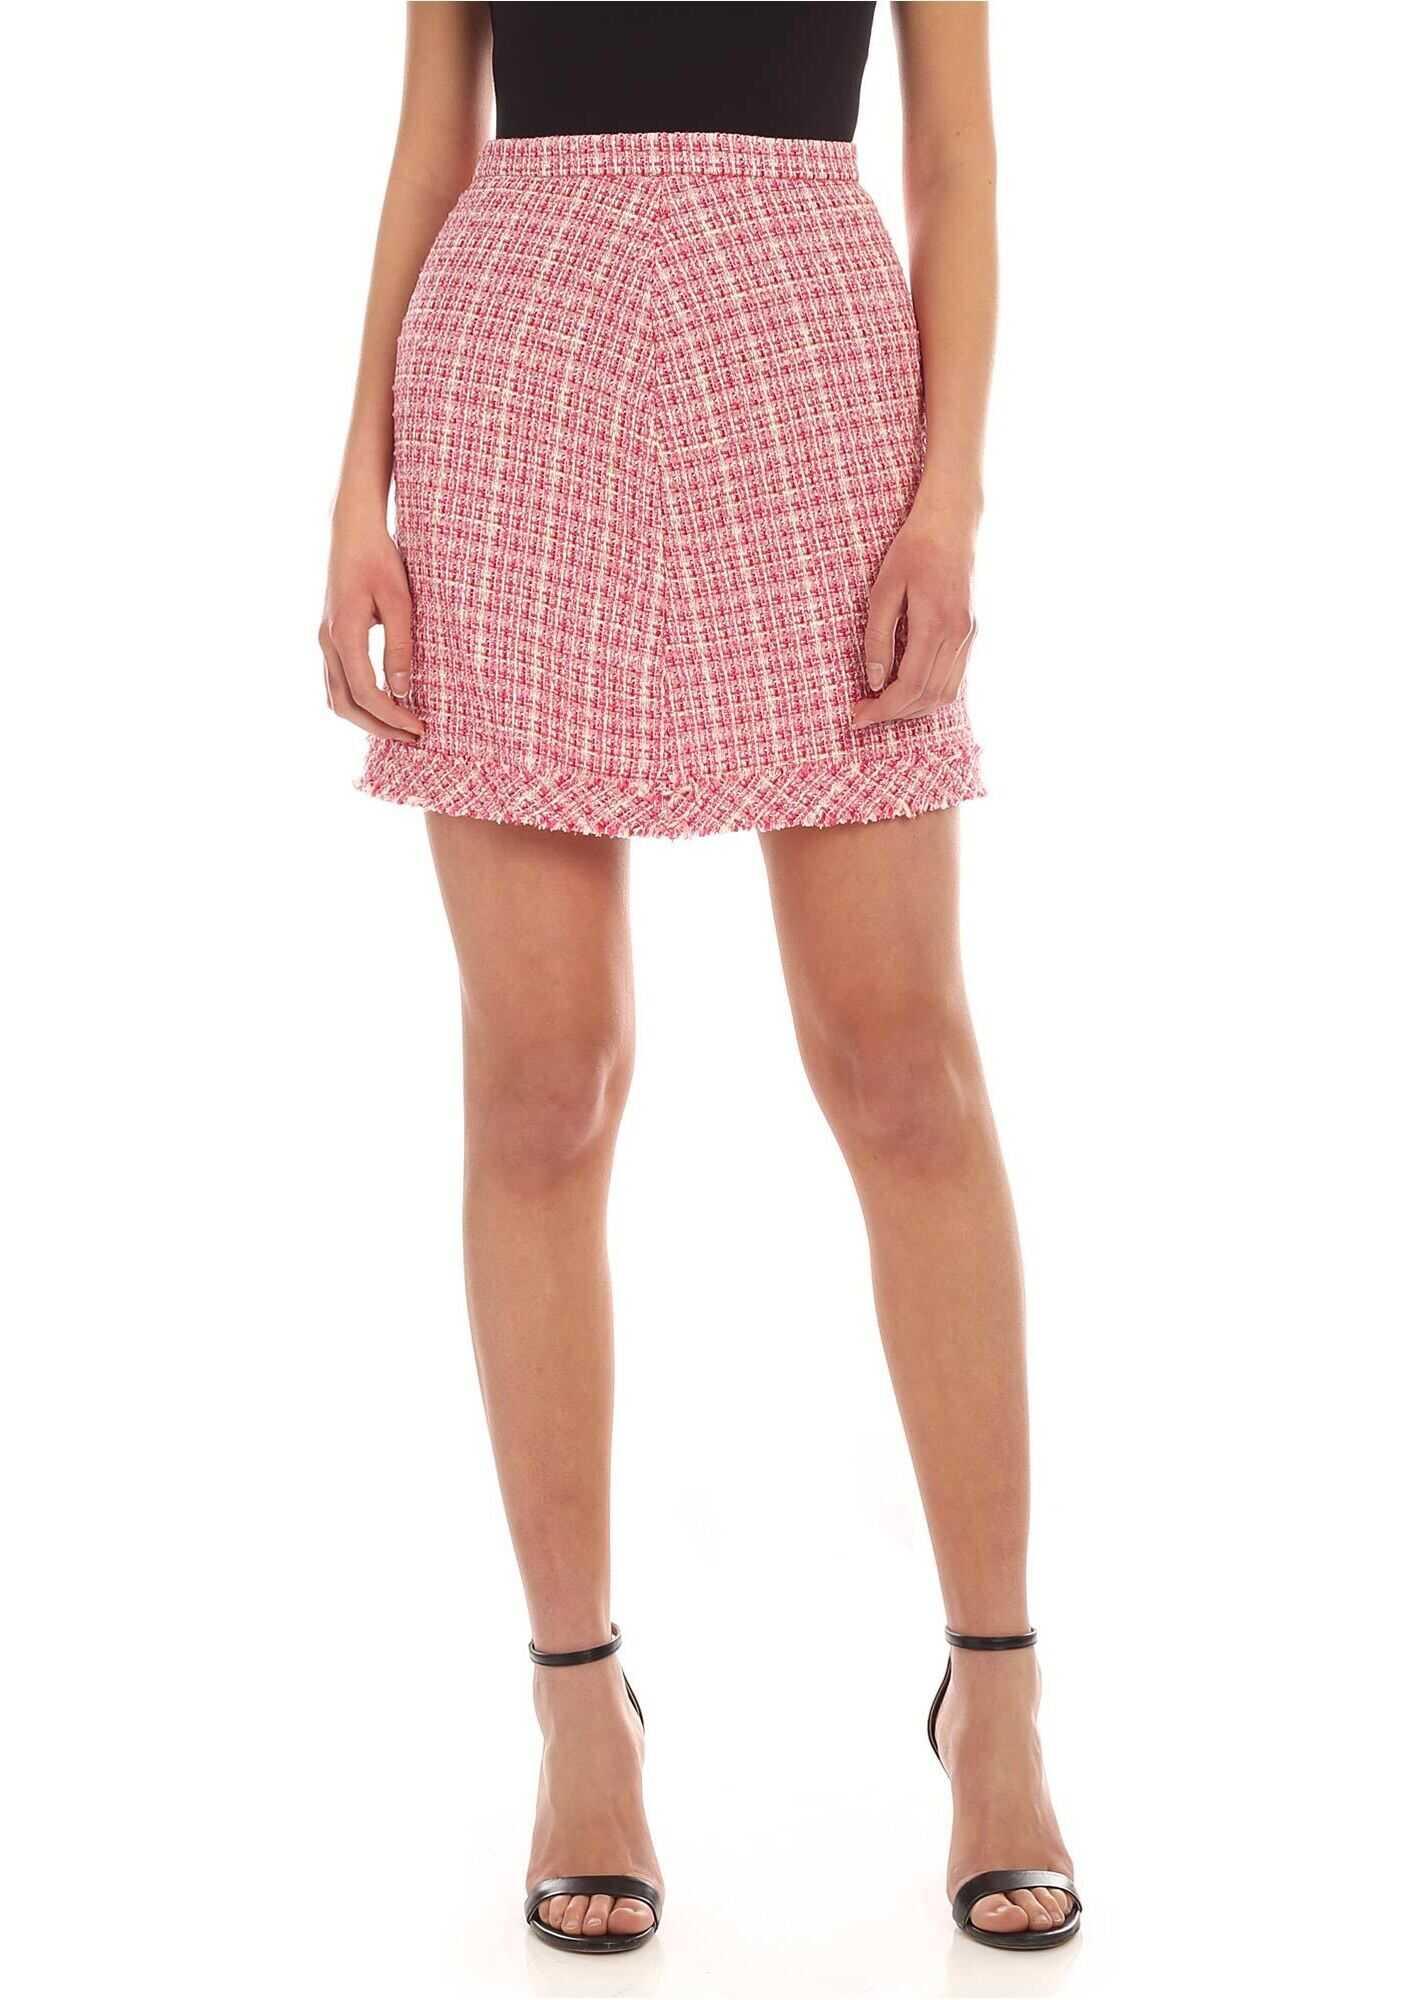 Be Blumarine Bouclè Short Skirt In Pink And White Pink